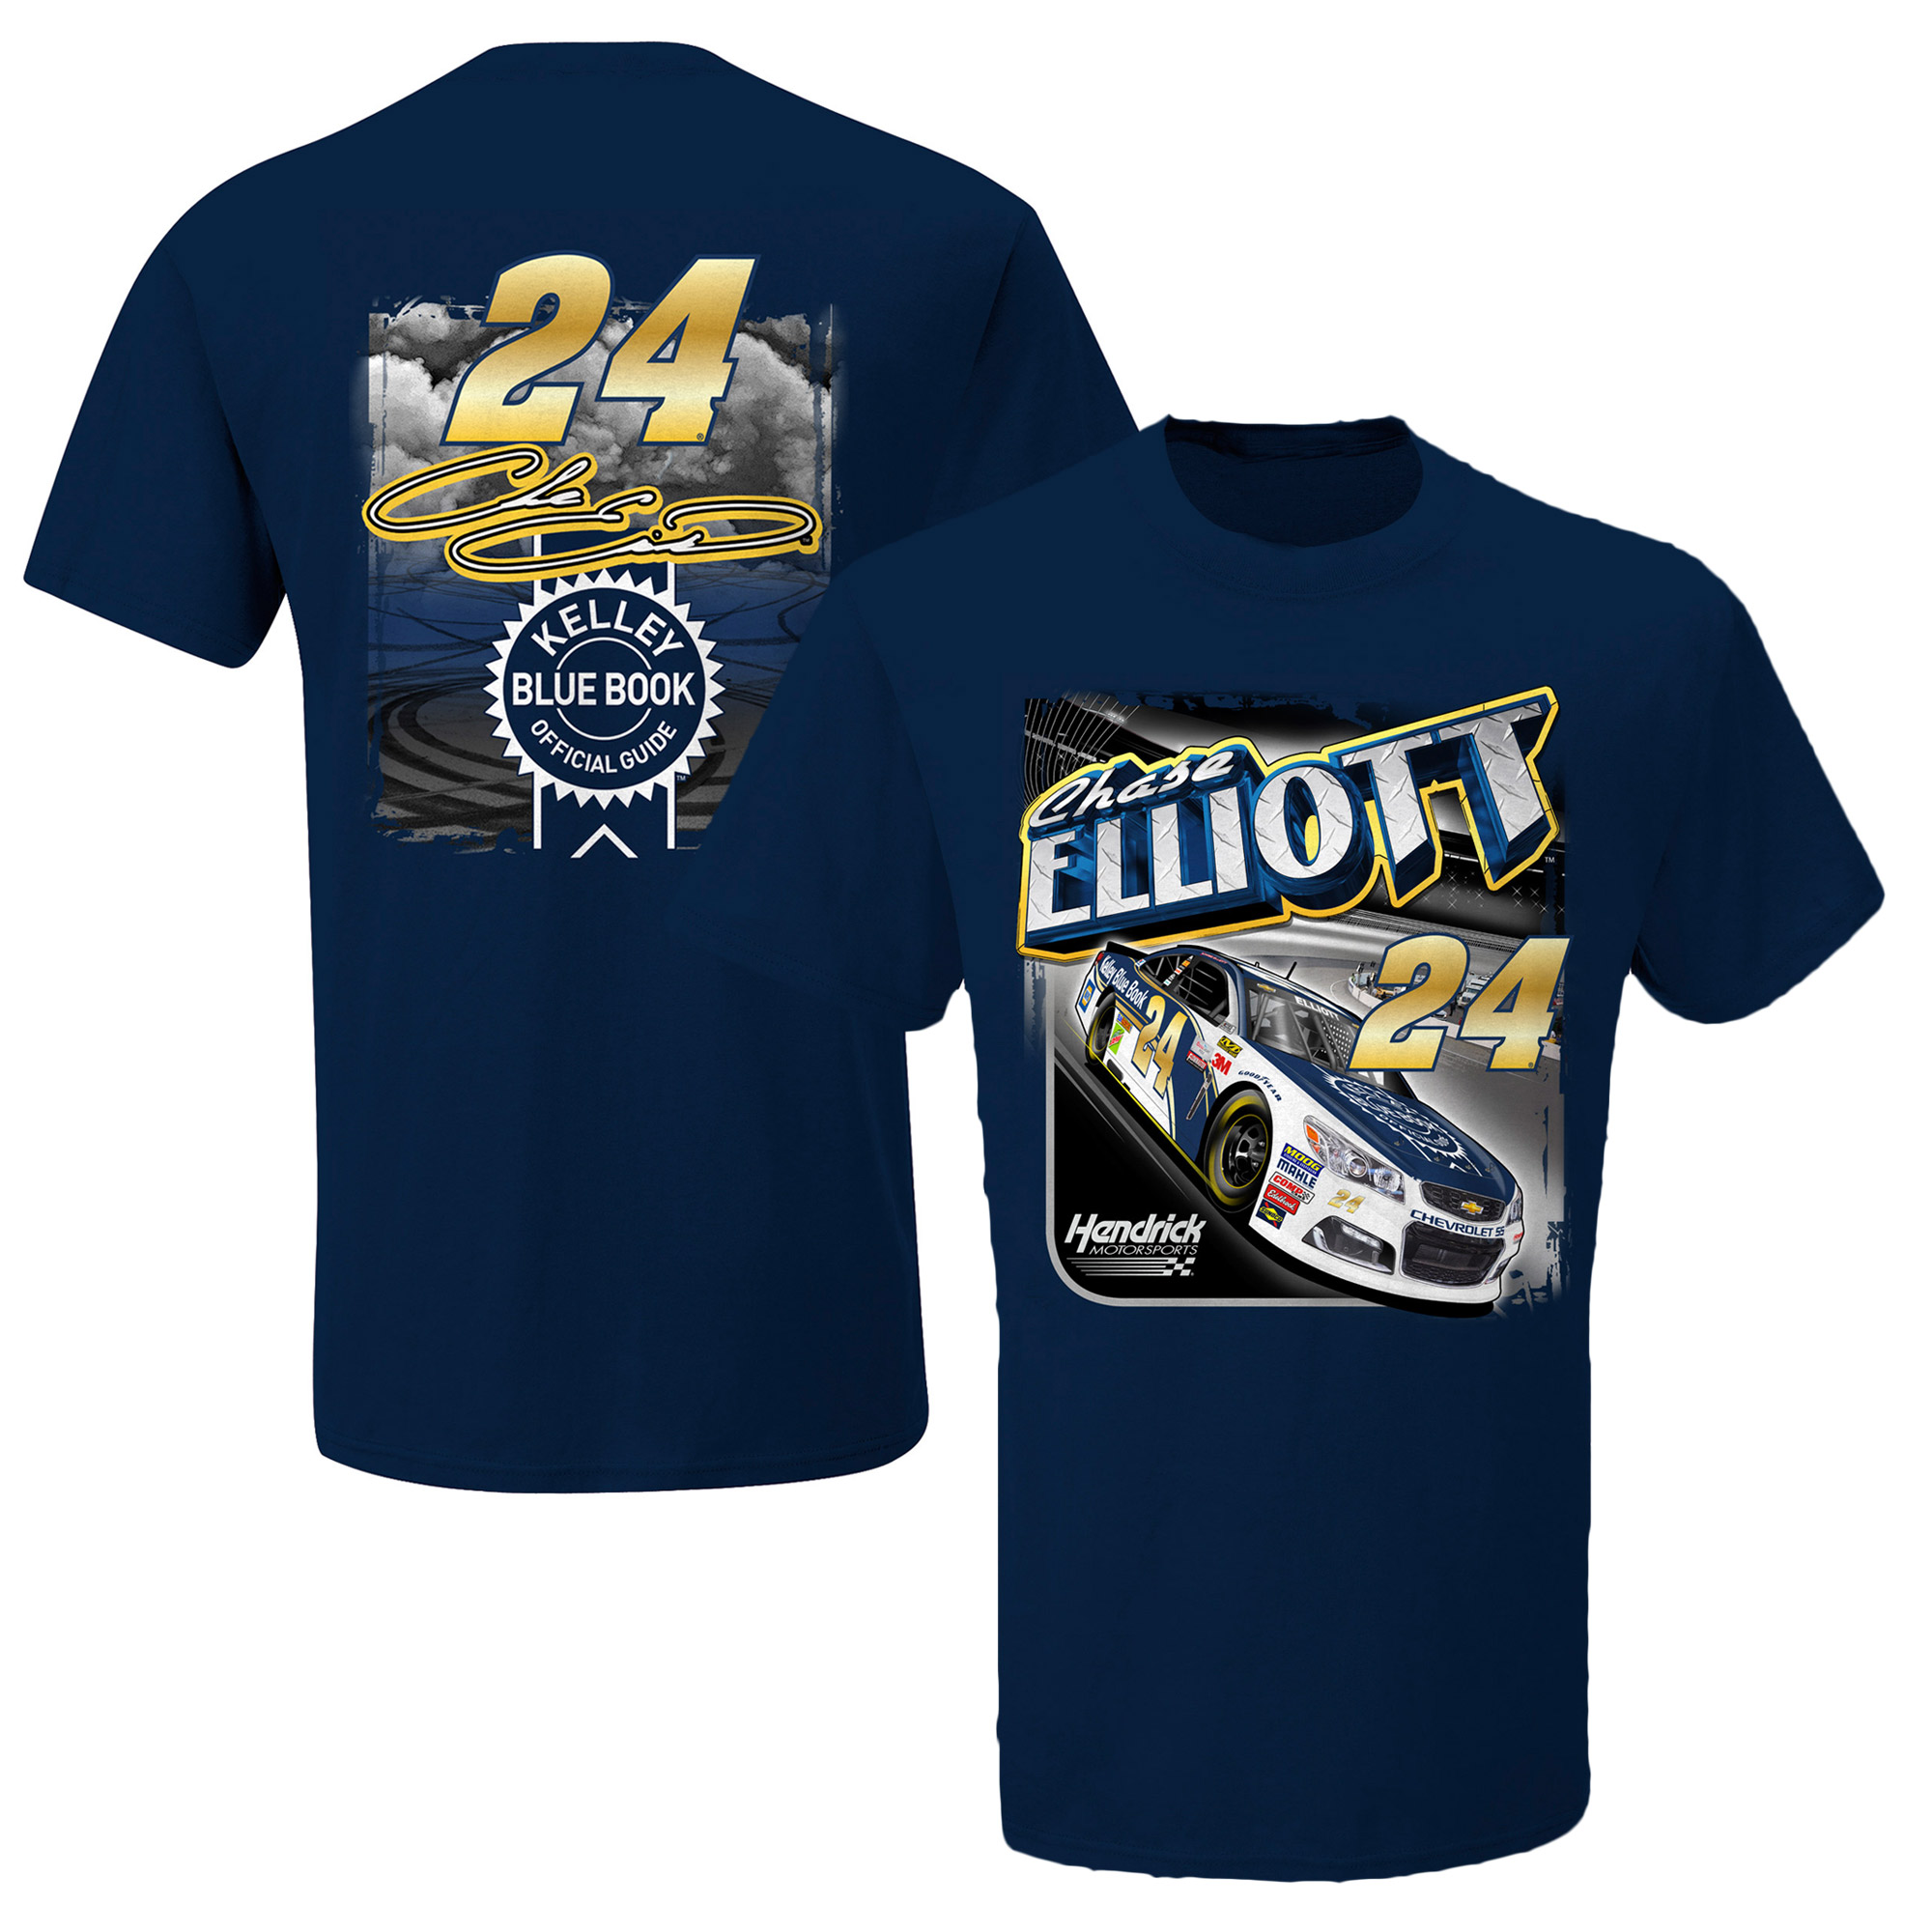 Chase Elliott Kelley Blue Book T-Shirt - Navy